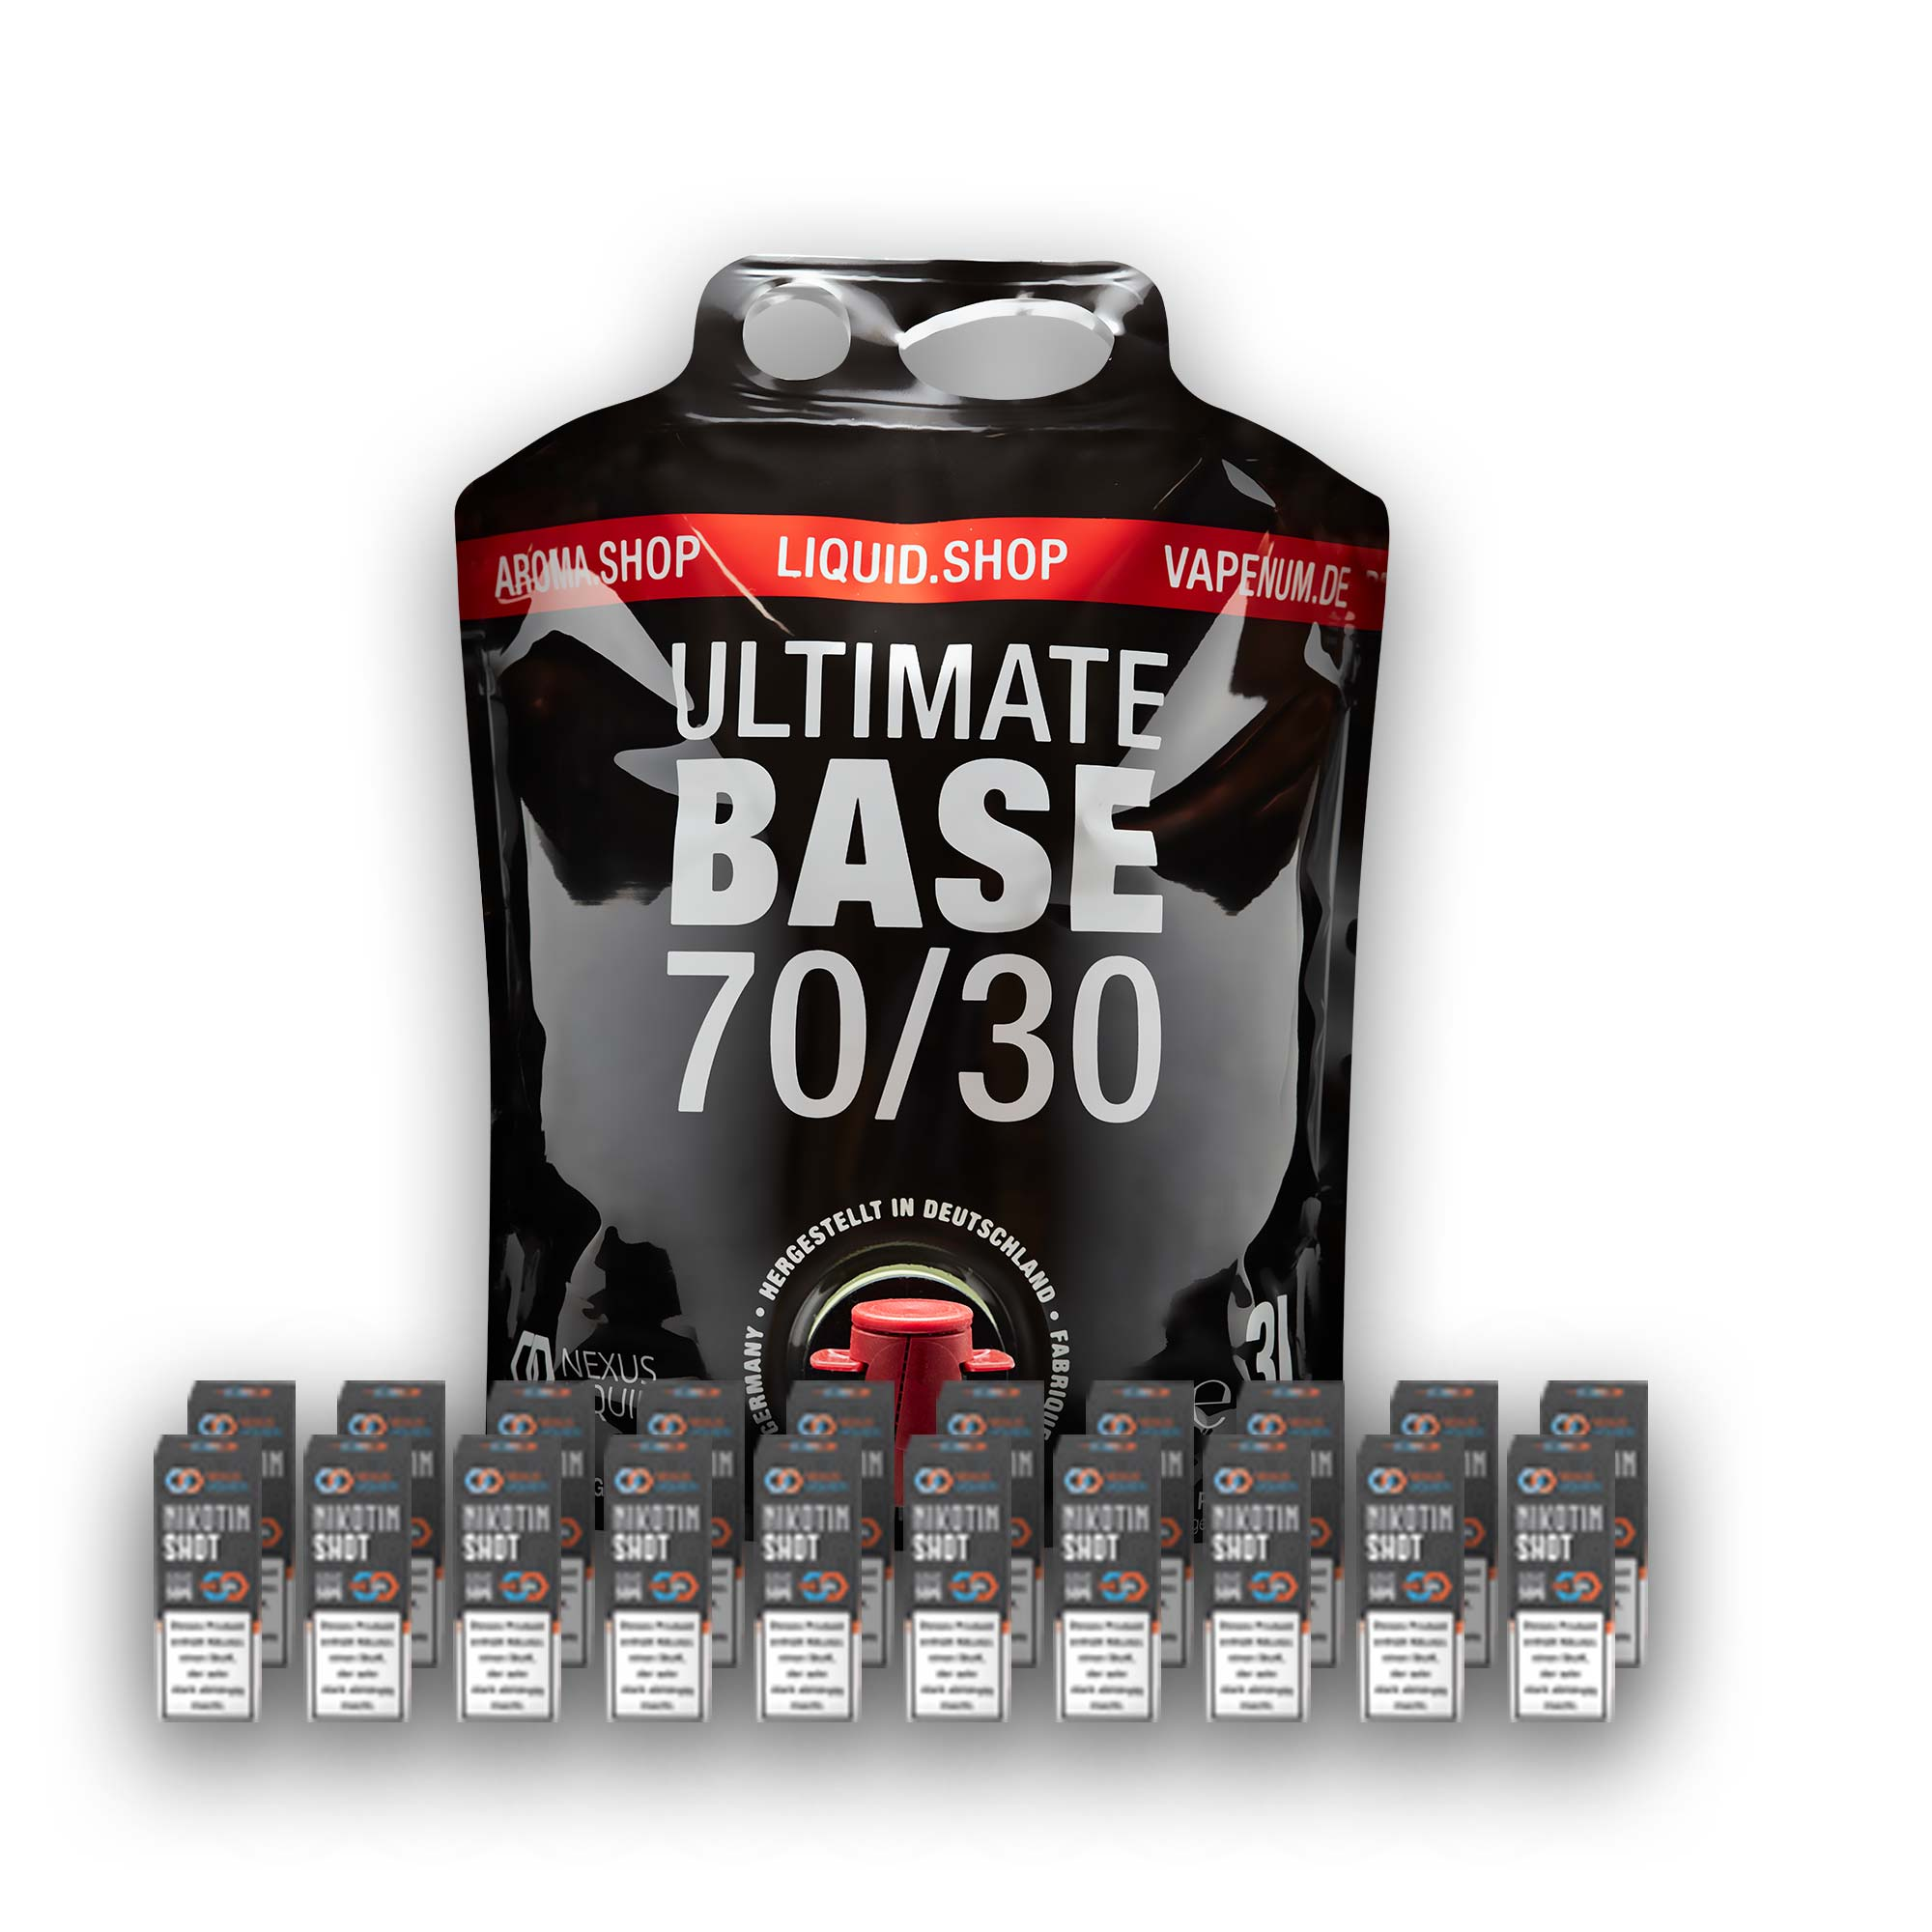 3L Ultimate Base (70/30) inklusive 20 Nik Shots 18mg